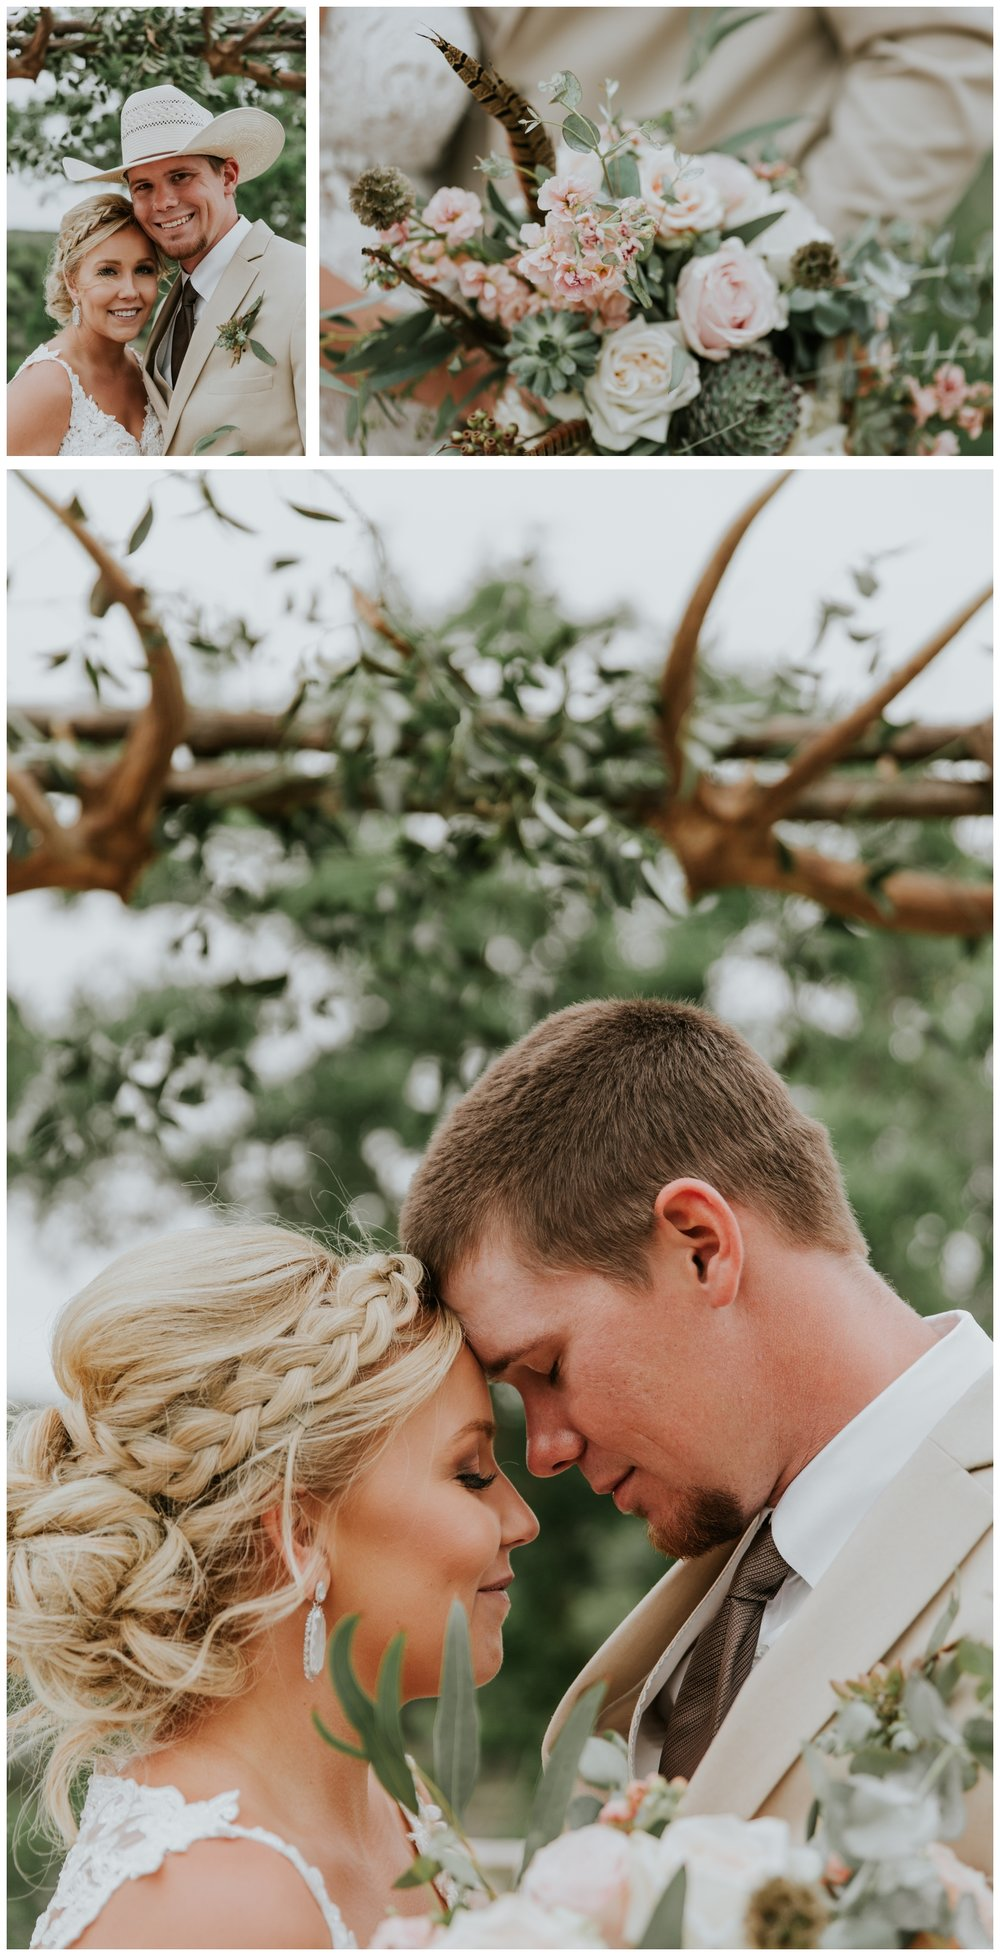 T+K Austin, Texas Outdoor Ranch Wedding Photography_0078.jpg